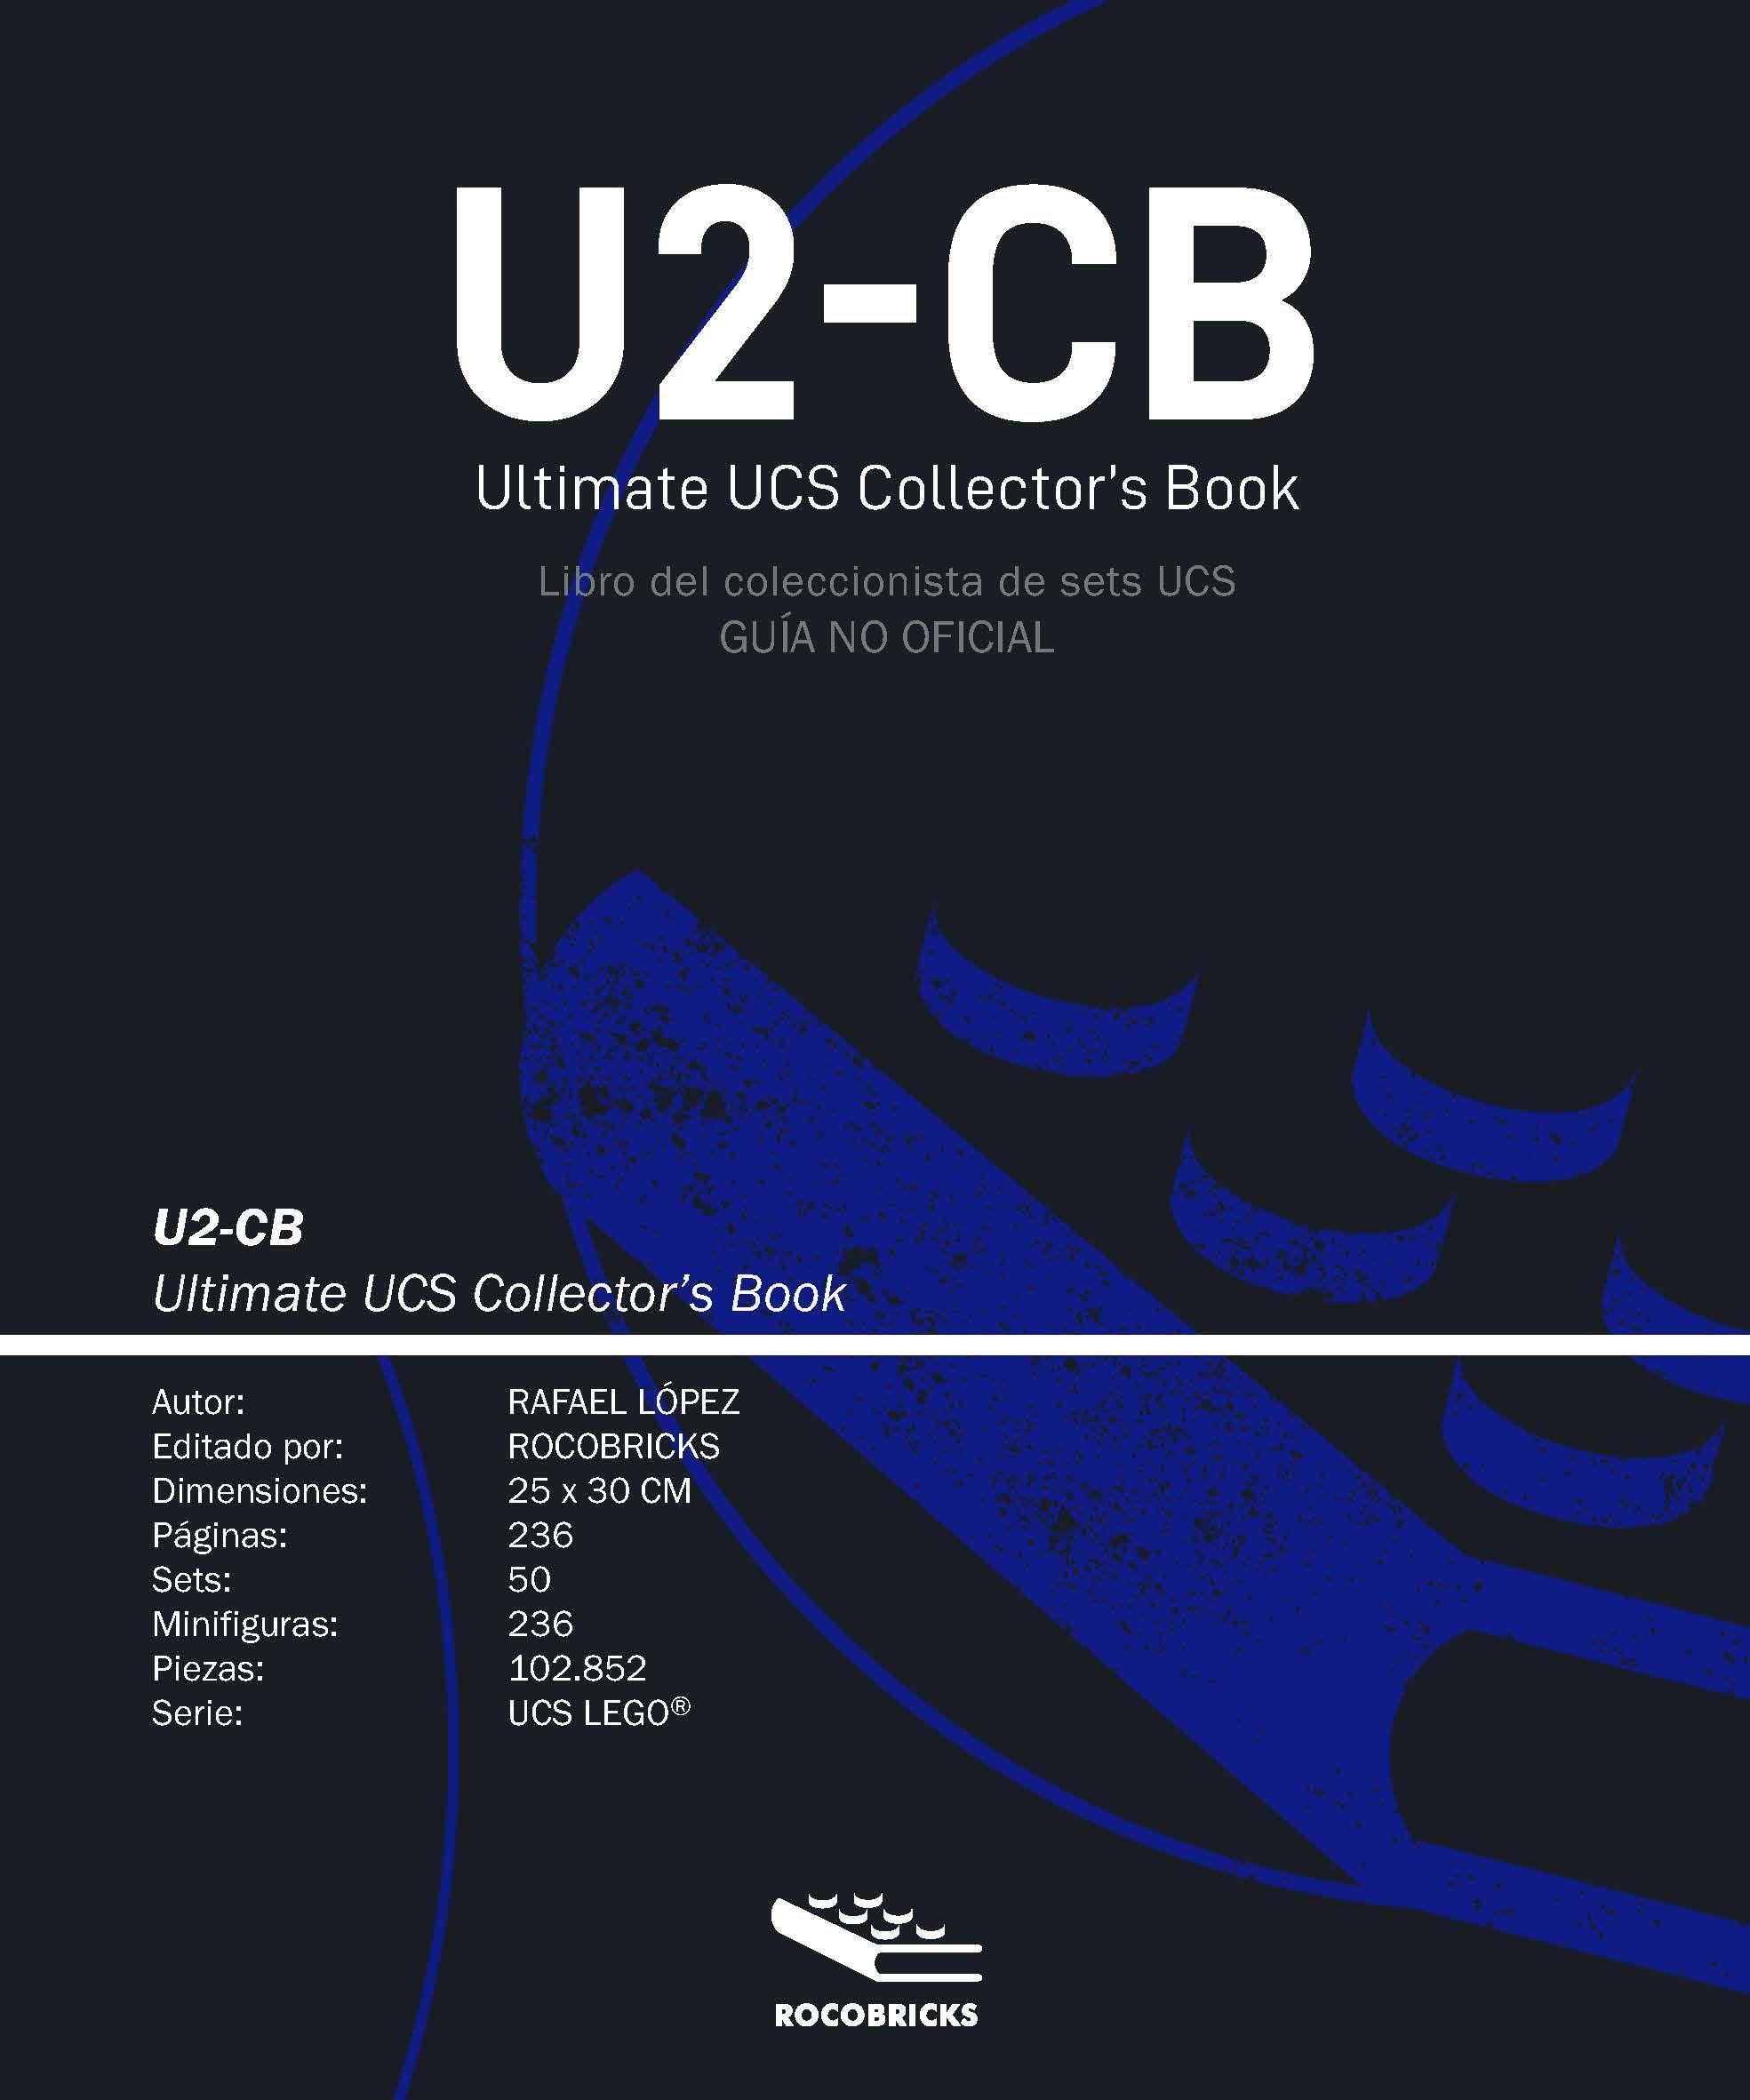 U2-CB ULTIMATE UCS COLLECTOR'S BOOK (ESPAÑOL)